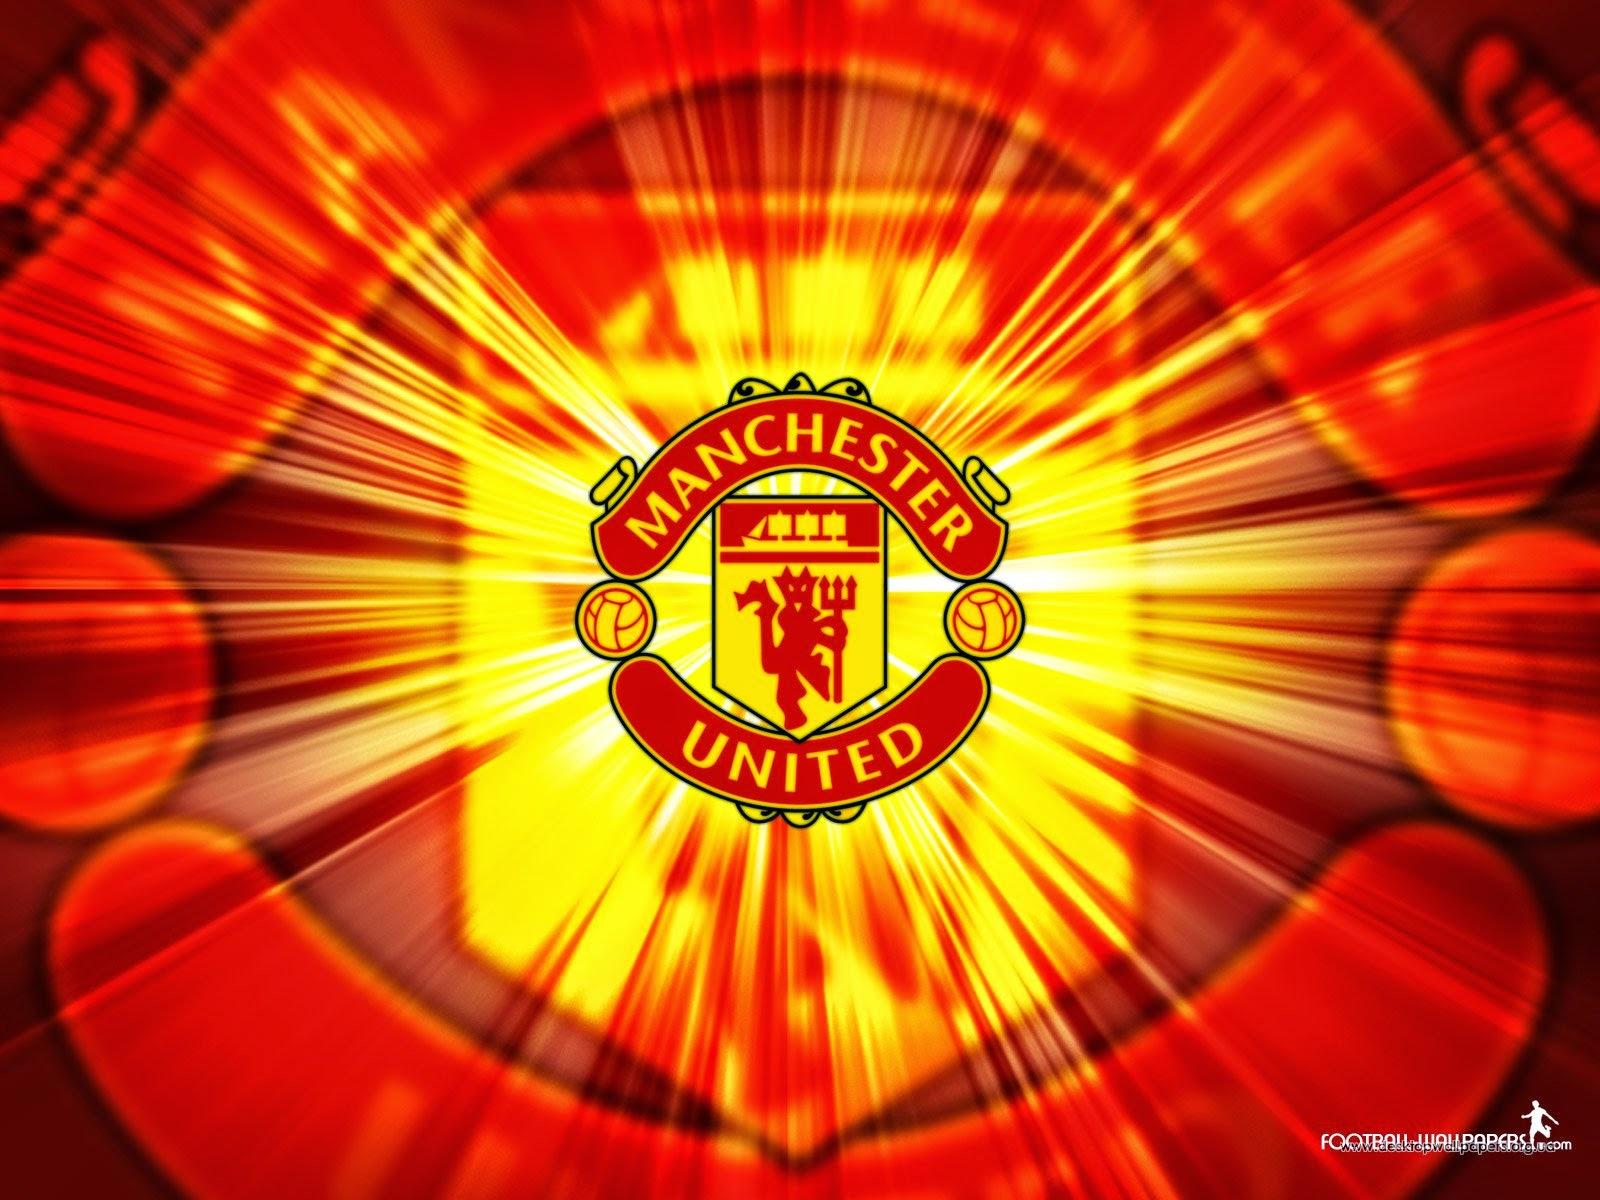 Manchester City Iphone Wallpaper Manchester United Football Club Wallpaper Football